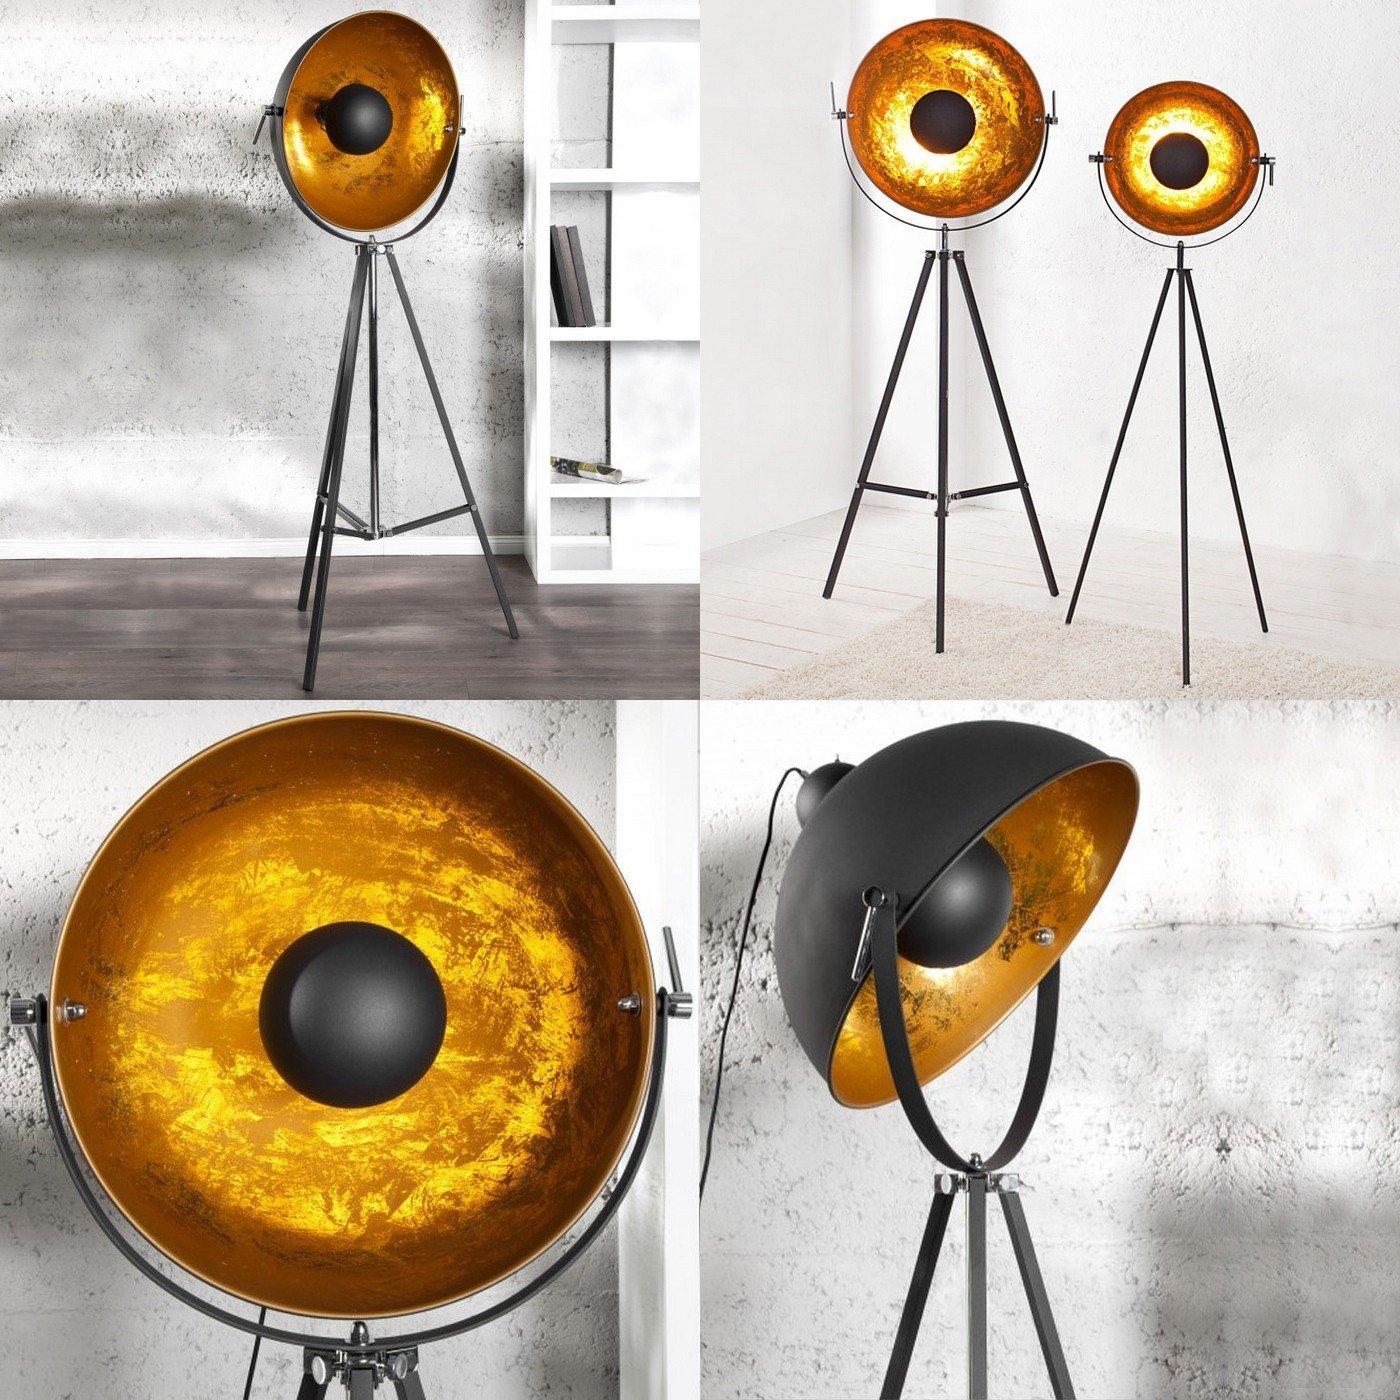 81Ld1zSFuxL._SL1400_ Faszinierend Stehlampe Studio Schwarz Gold Dekorationen